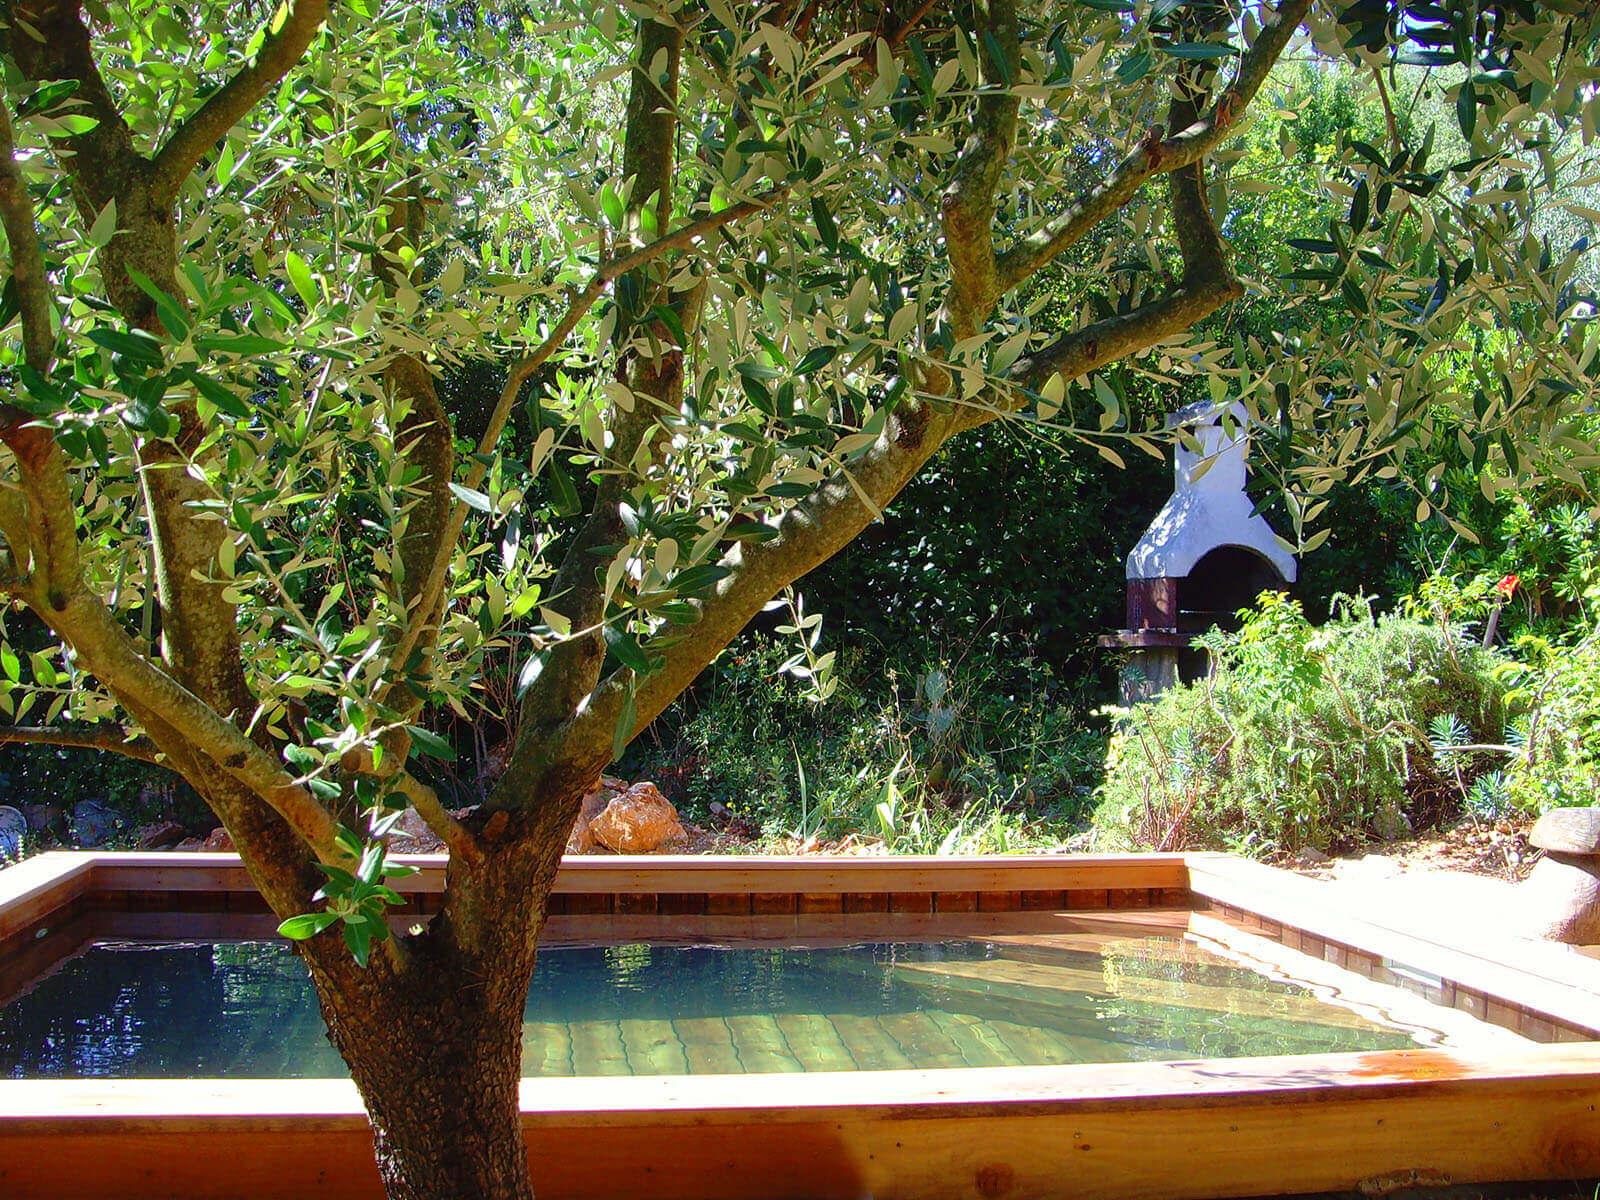 photos de petites piscines en bois sans liner odyssea piscines. Black Bedroom Furniture Sets. Home Design Ideas